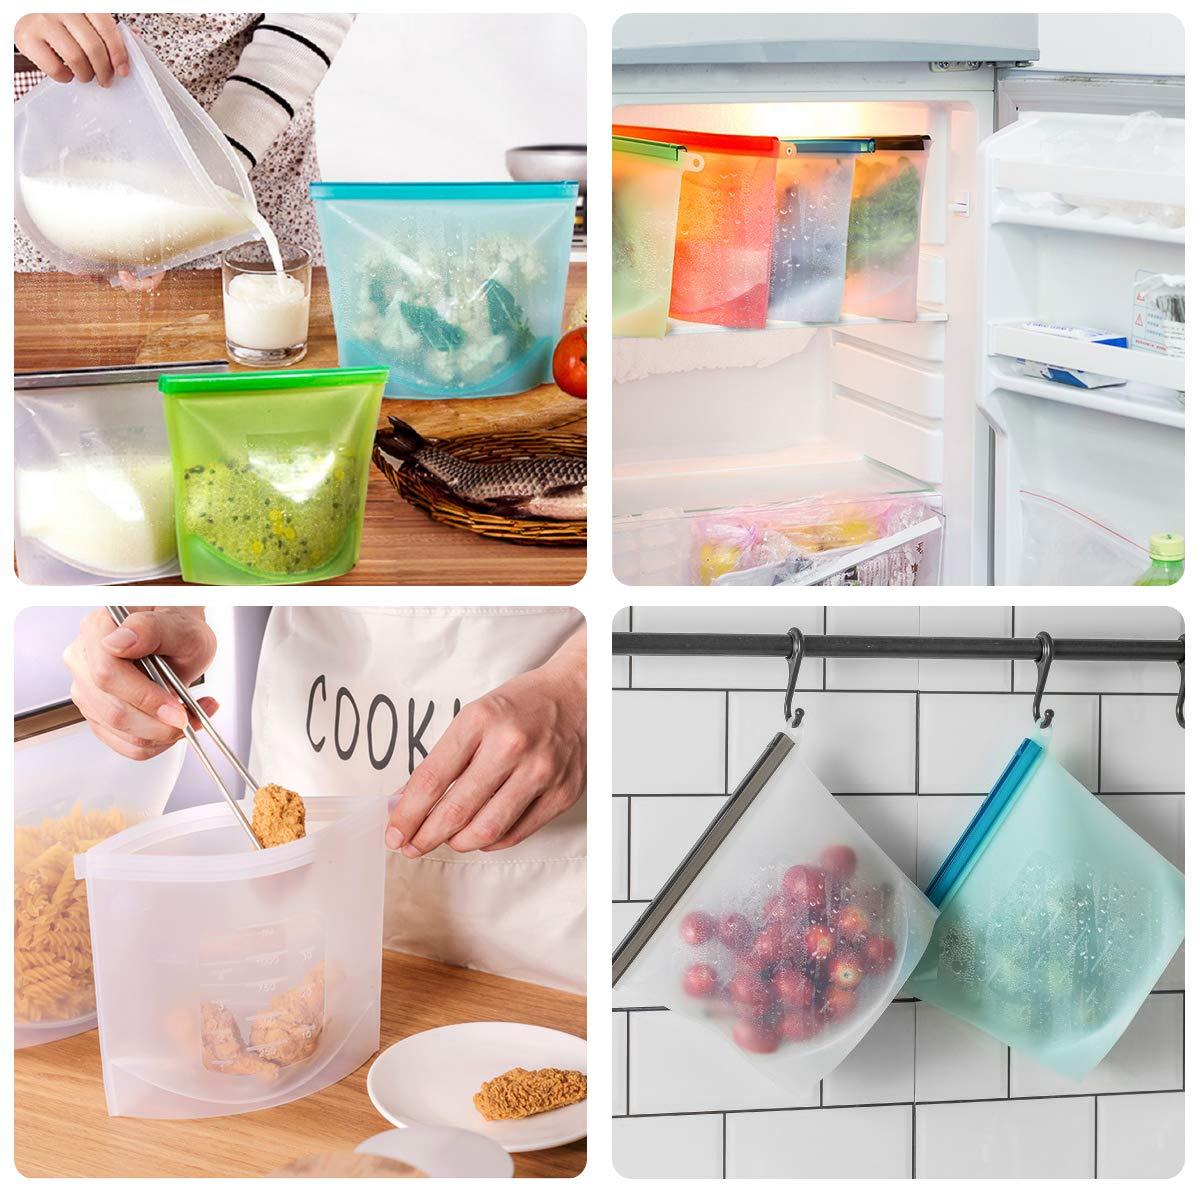 Amazon.com: Bolsas reutilizables de silicona para ...